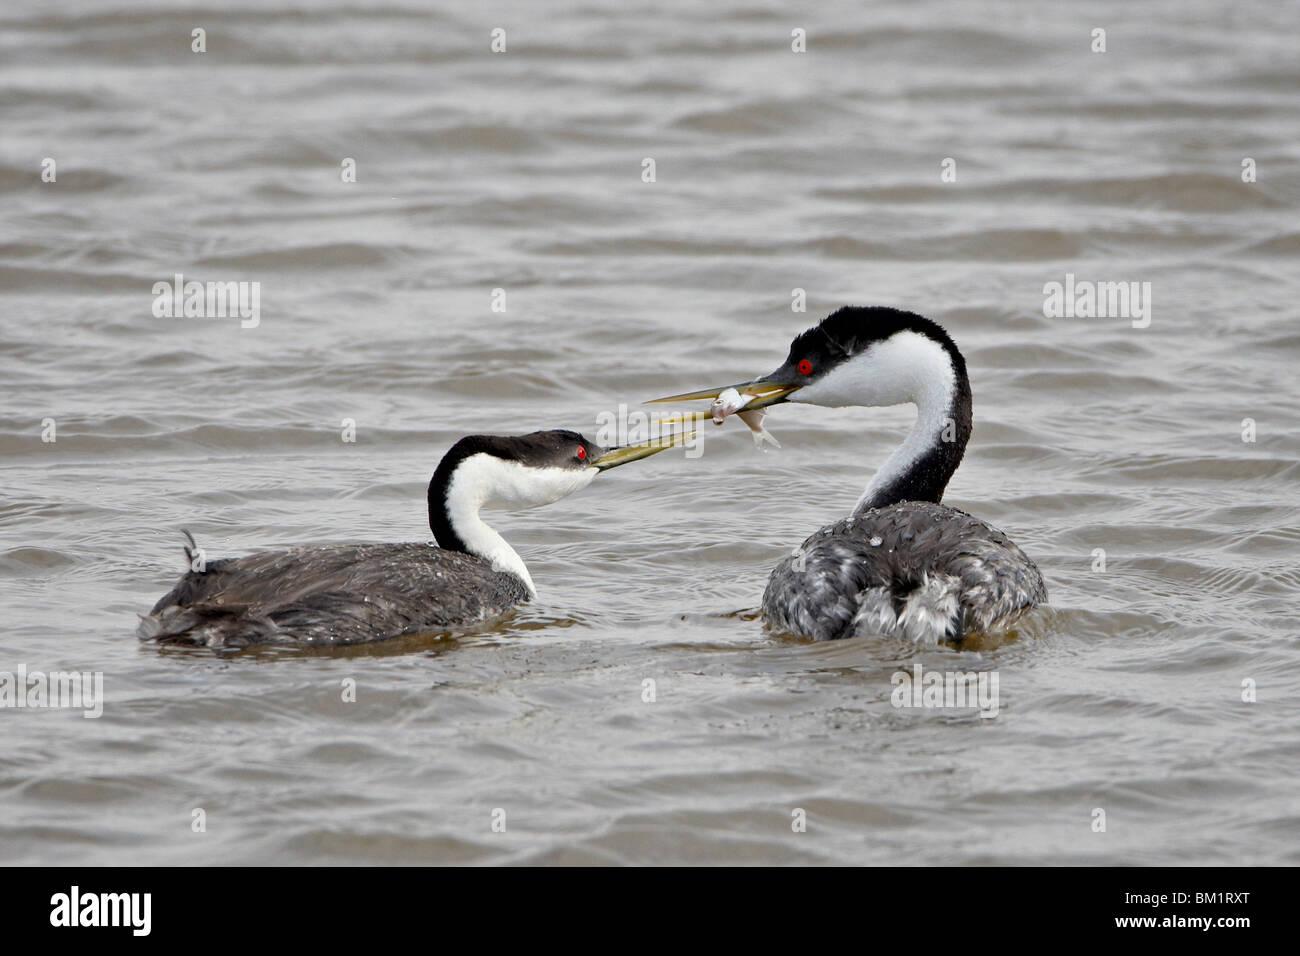 Western grebe (Aechmophorus occidentalis) courtship, Bear River Migratory Bird Refuge, Utah, United States of America - Stock Image